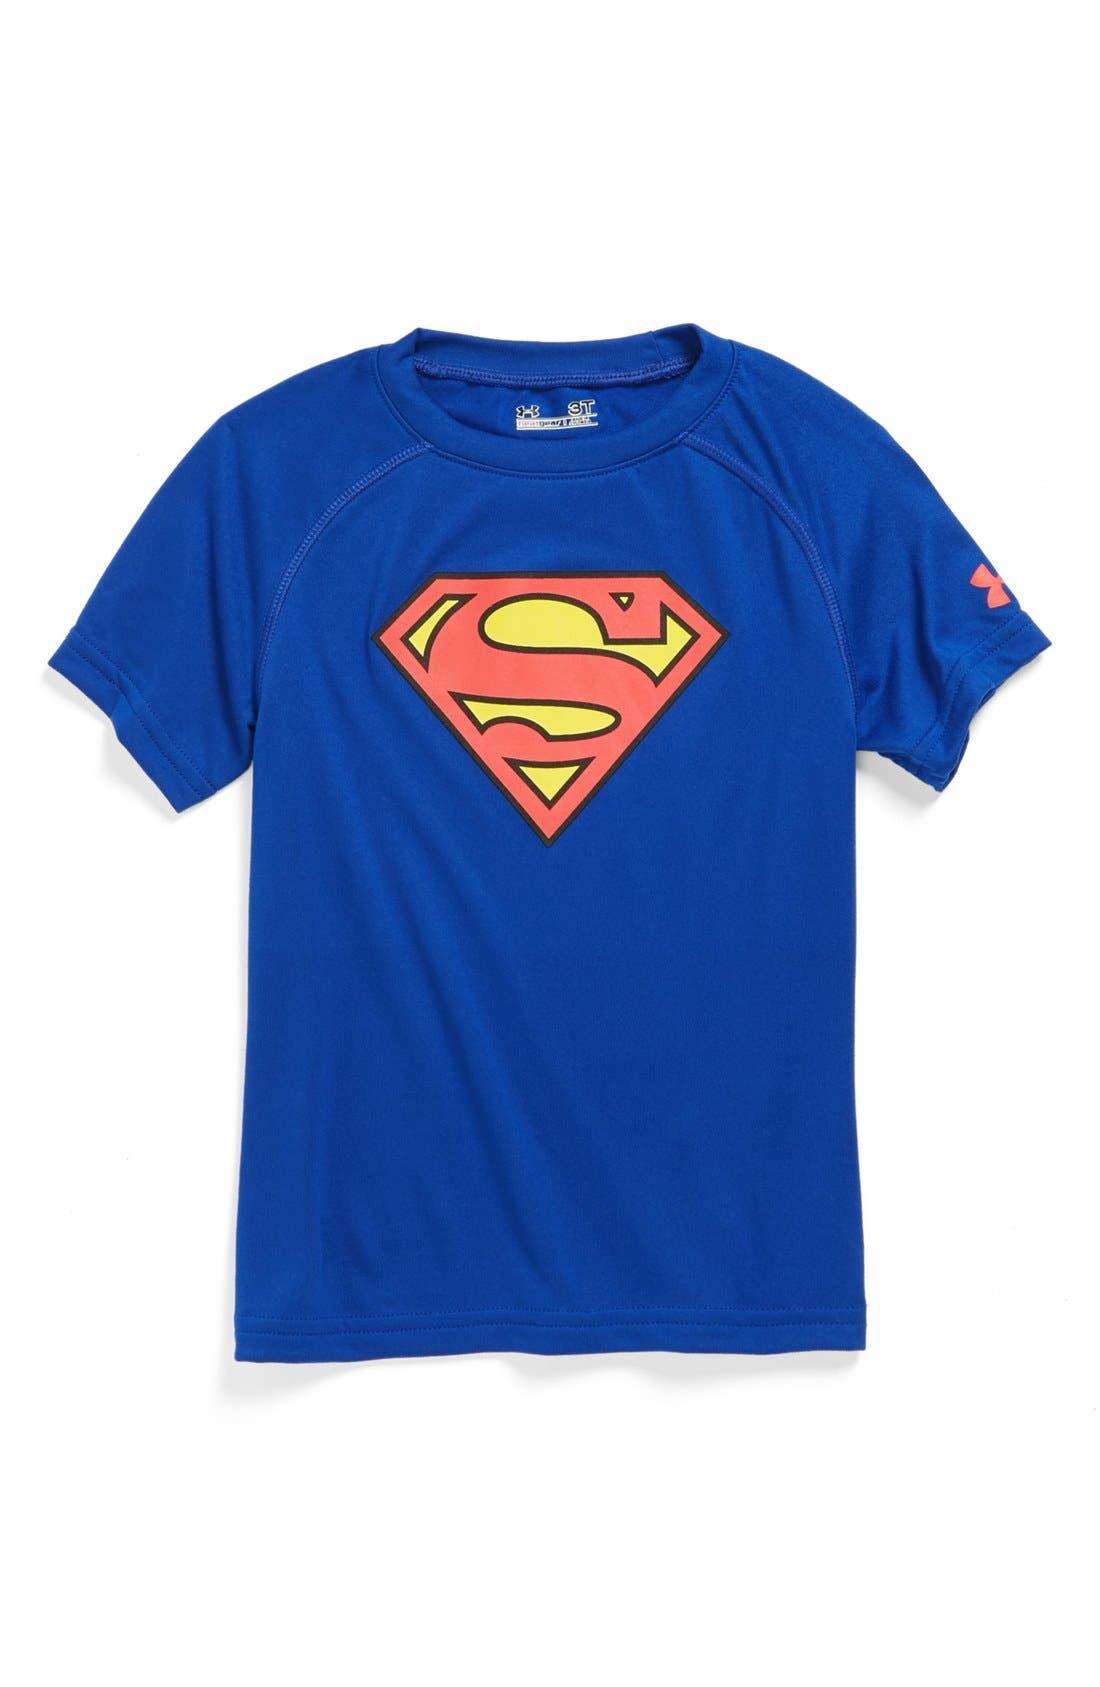 Main Image - Under Armour 'Alter Ego - Superman' HeatGear® T-shirt (Toddler Boys)